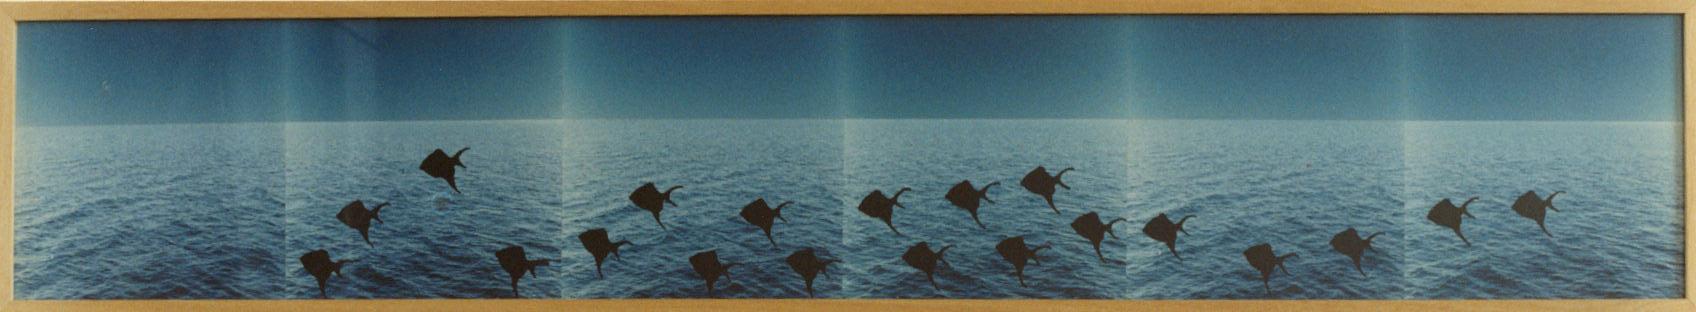 1996-School van slag- foto's, lak, 32x175cm